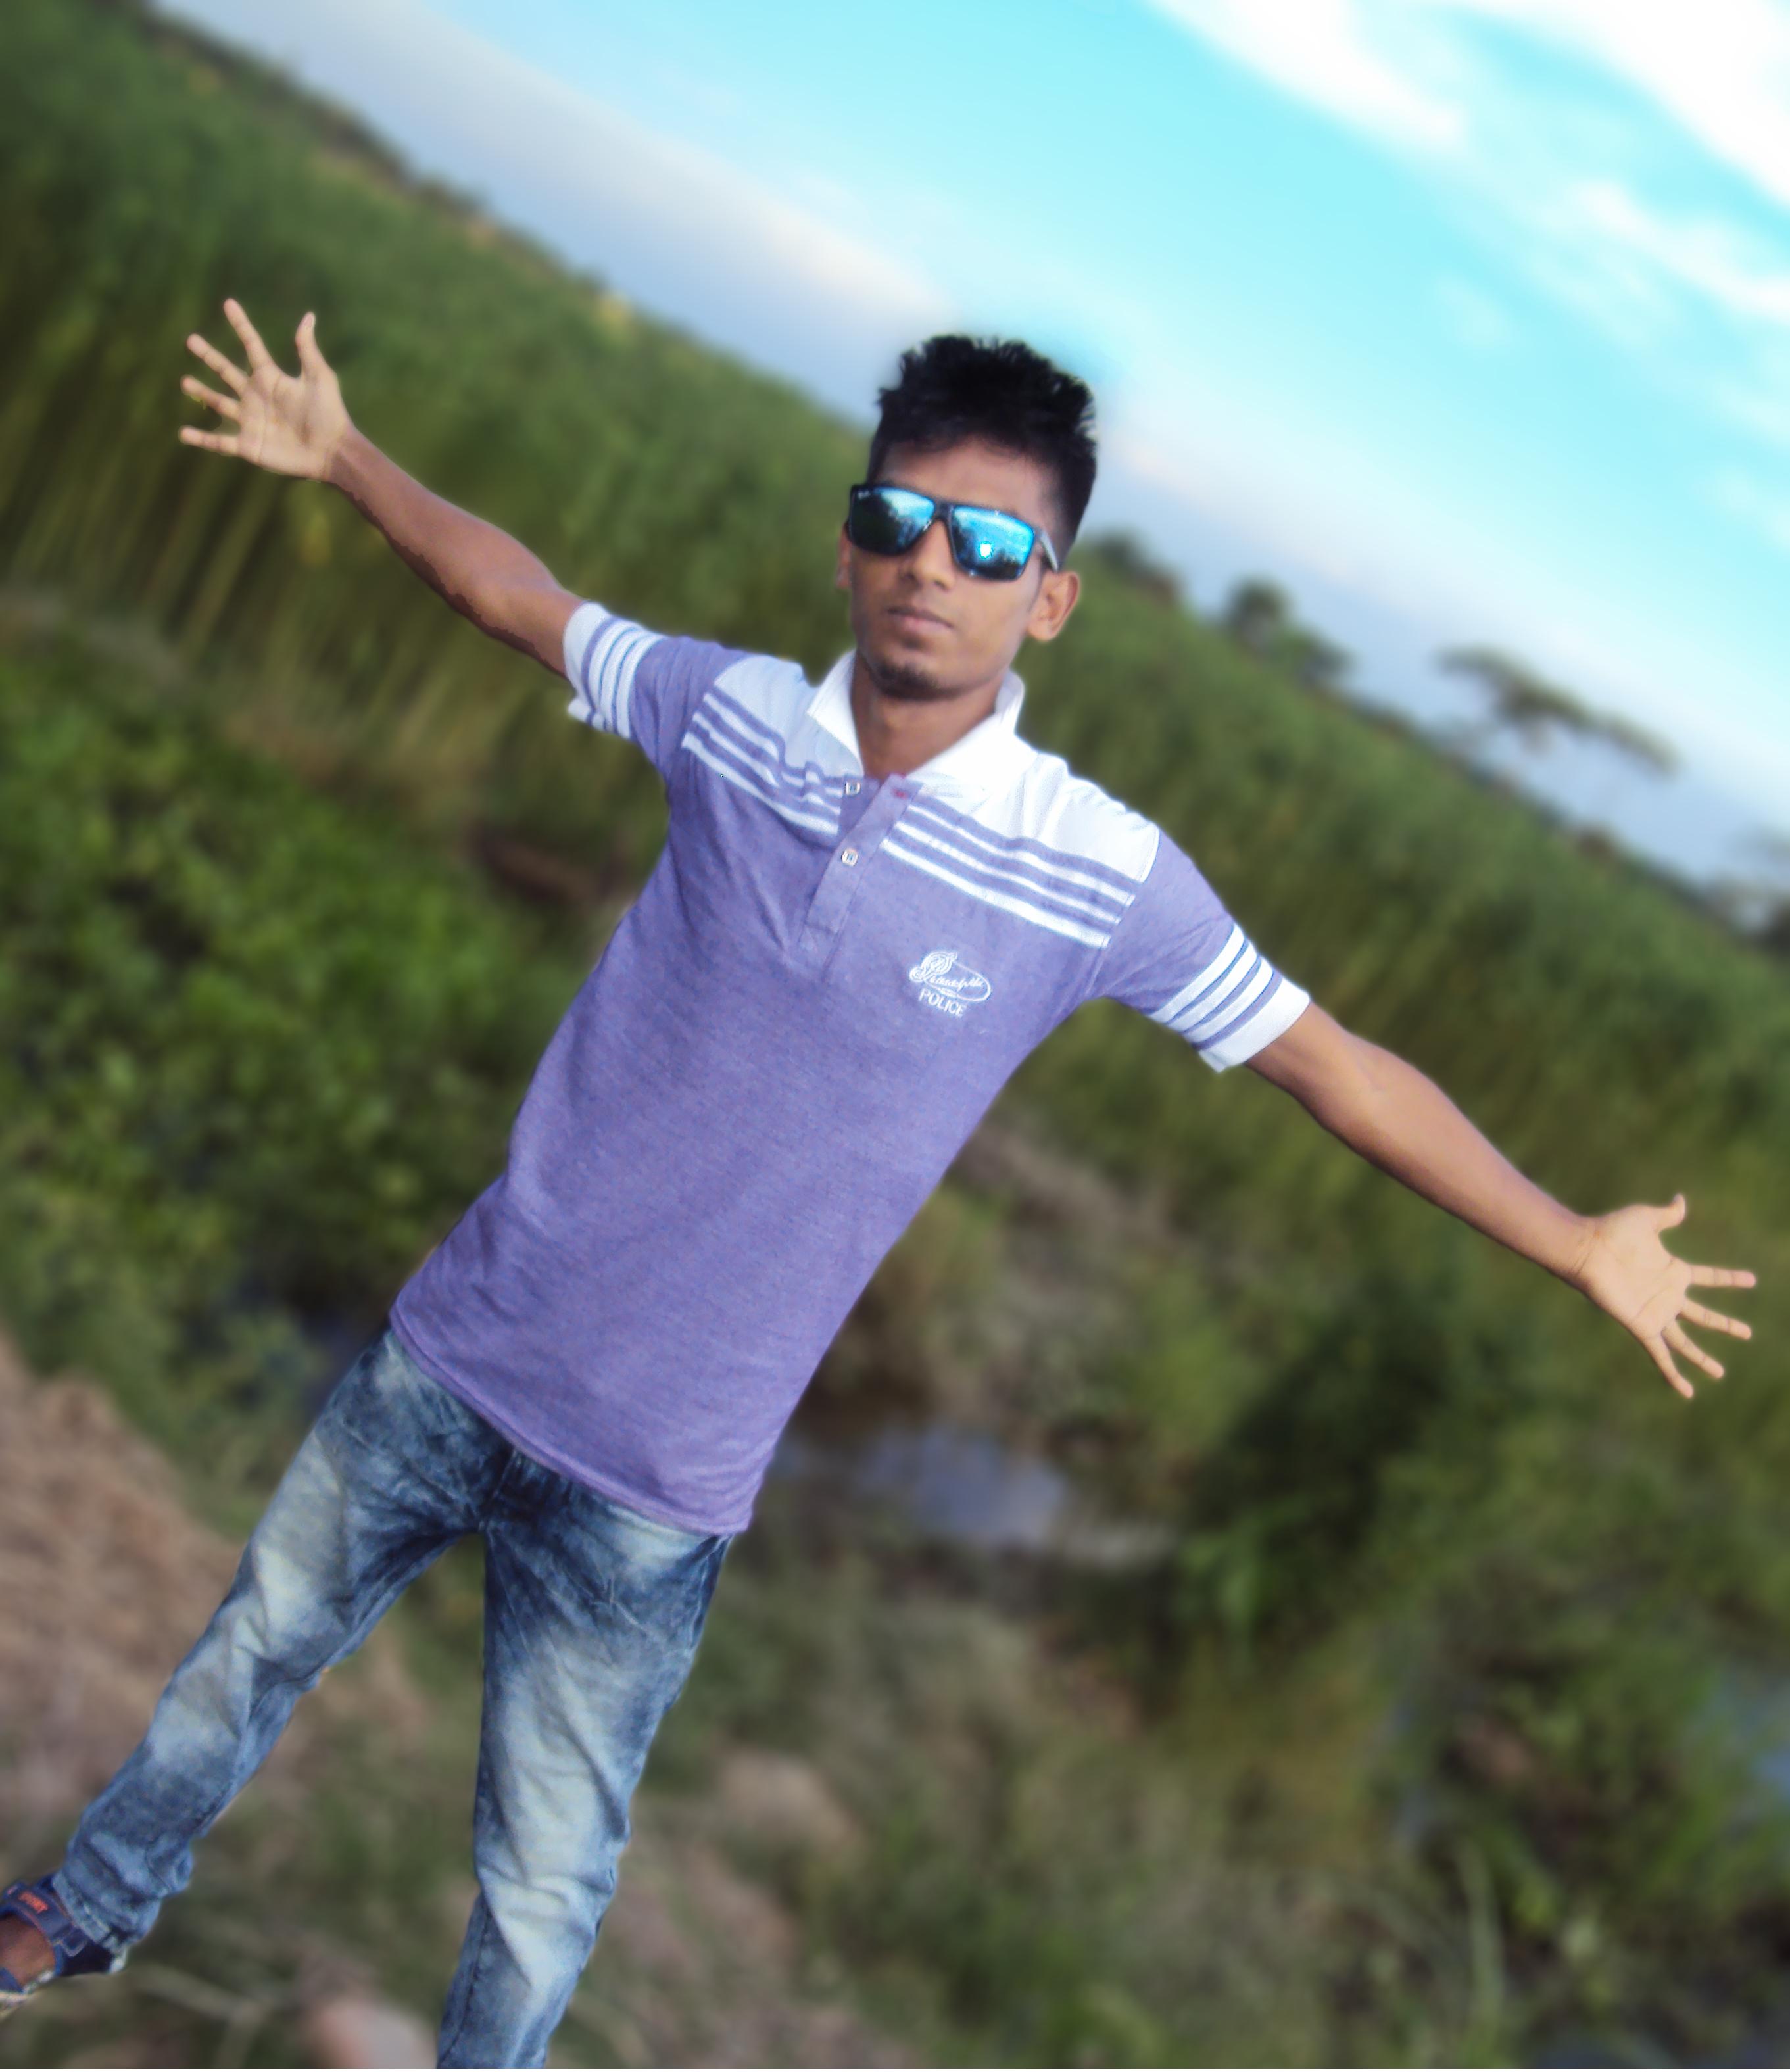 hasmot